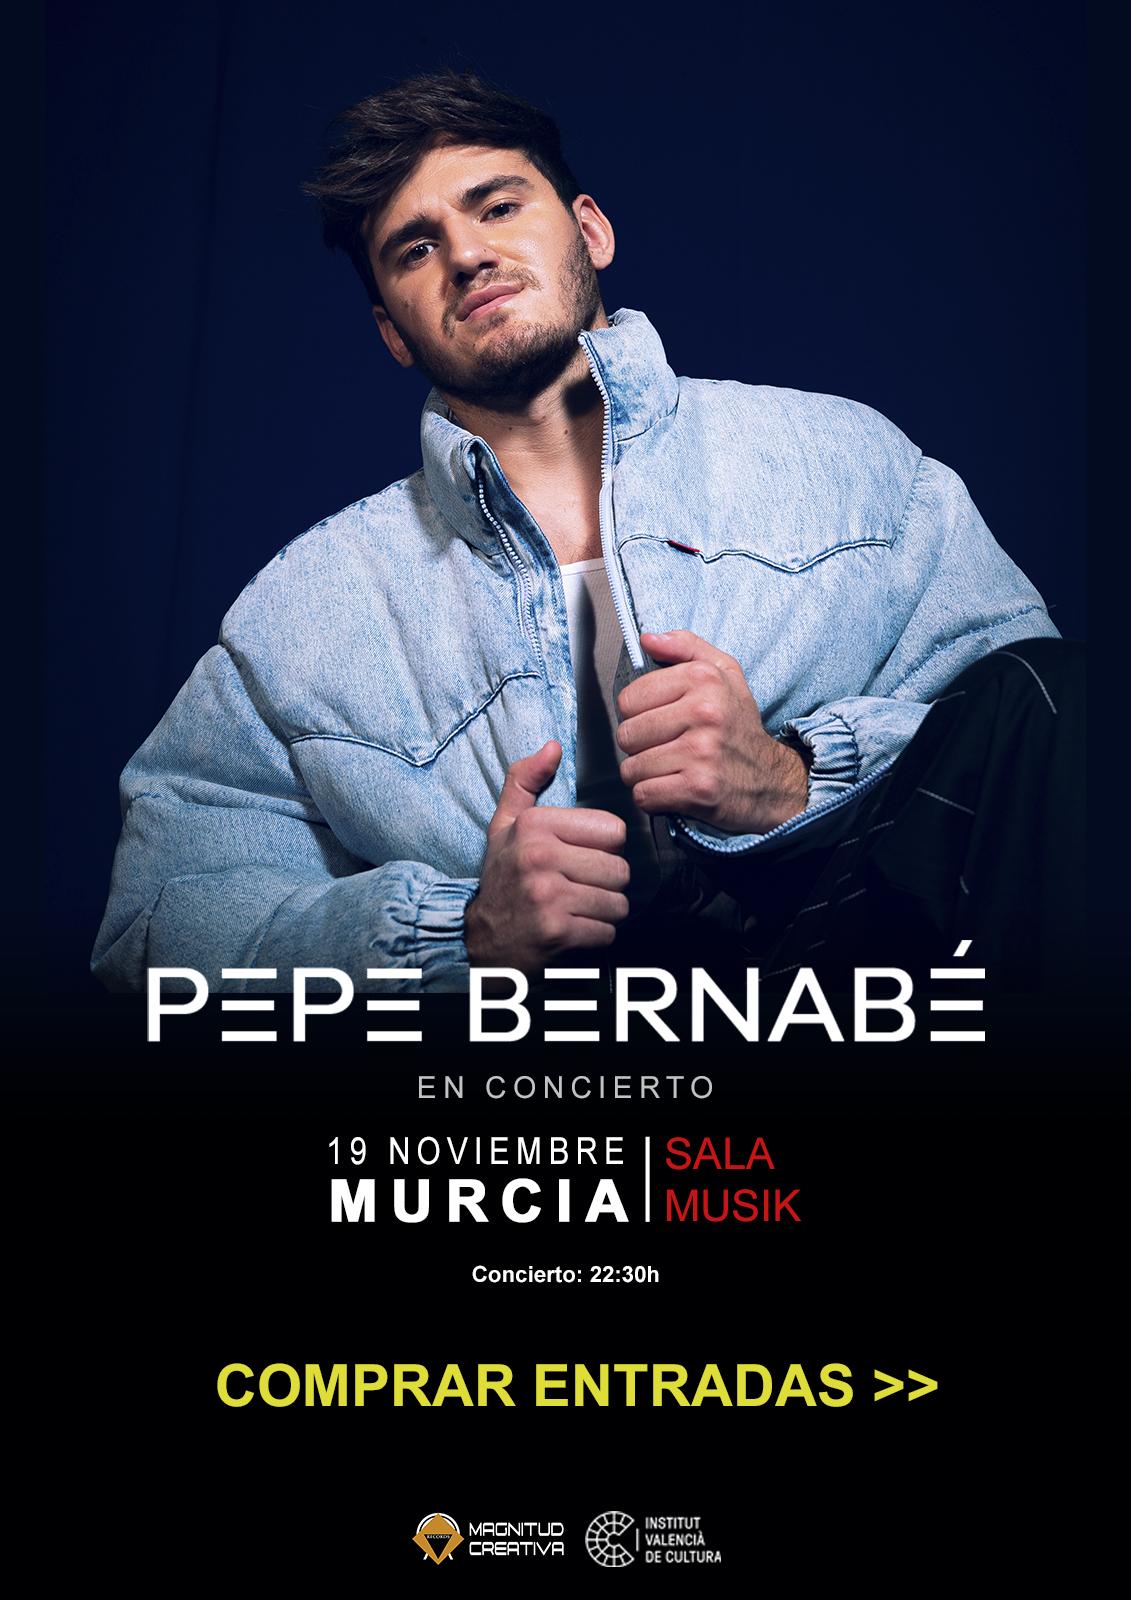 Concierto Pepe Bernabé Murcia